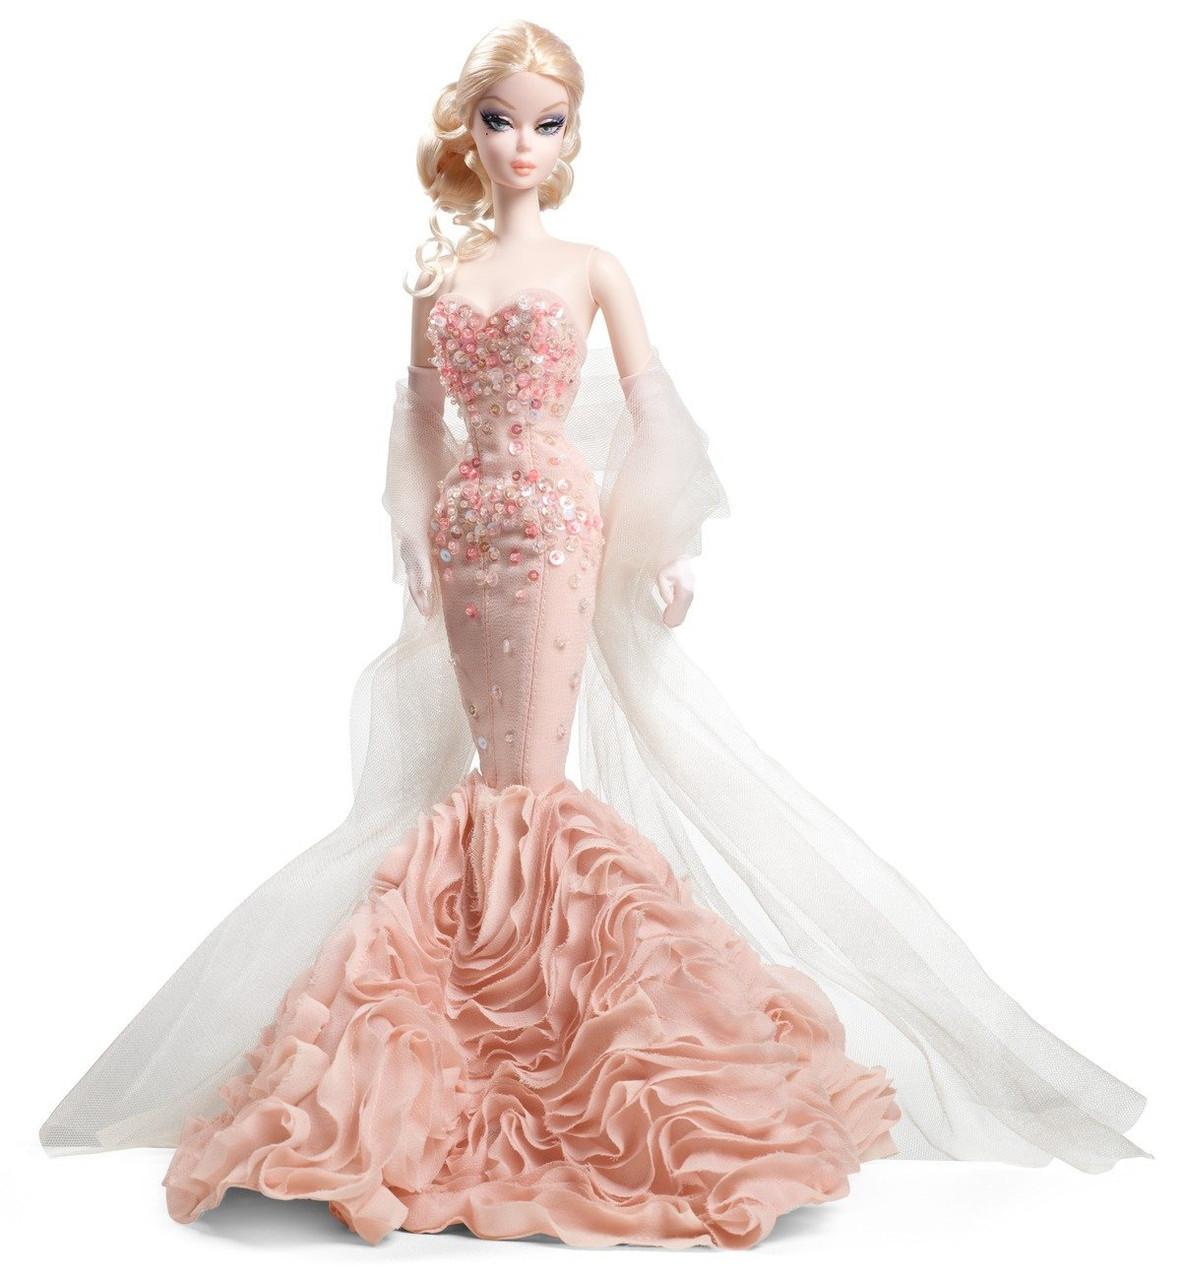 Коллекционная кукла Барби Силкстоун Платье Русалка / Mermaid Gown Barbie Doll